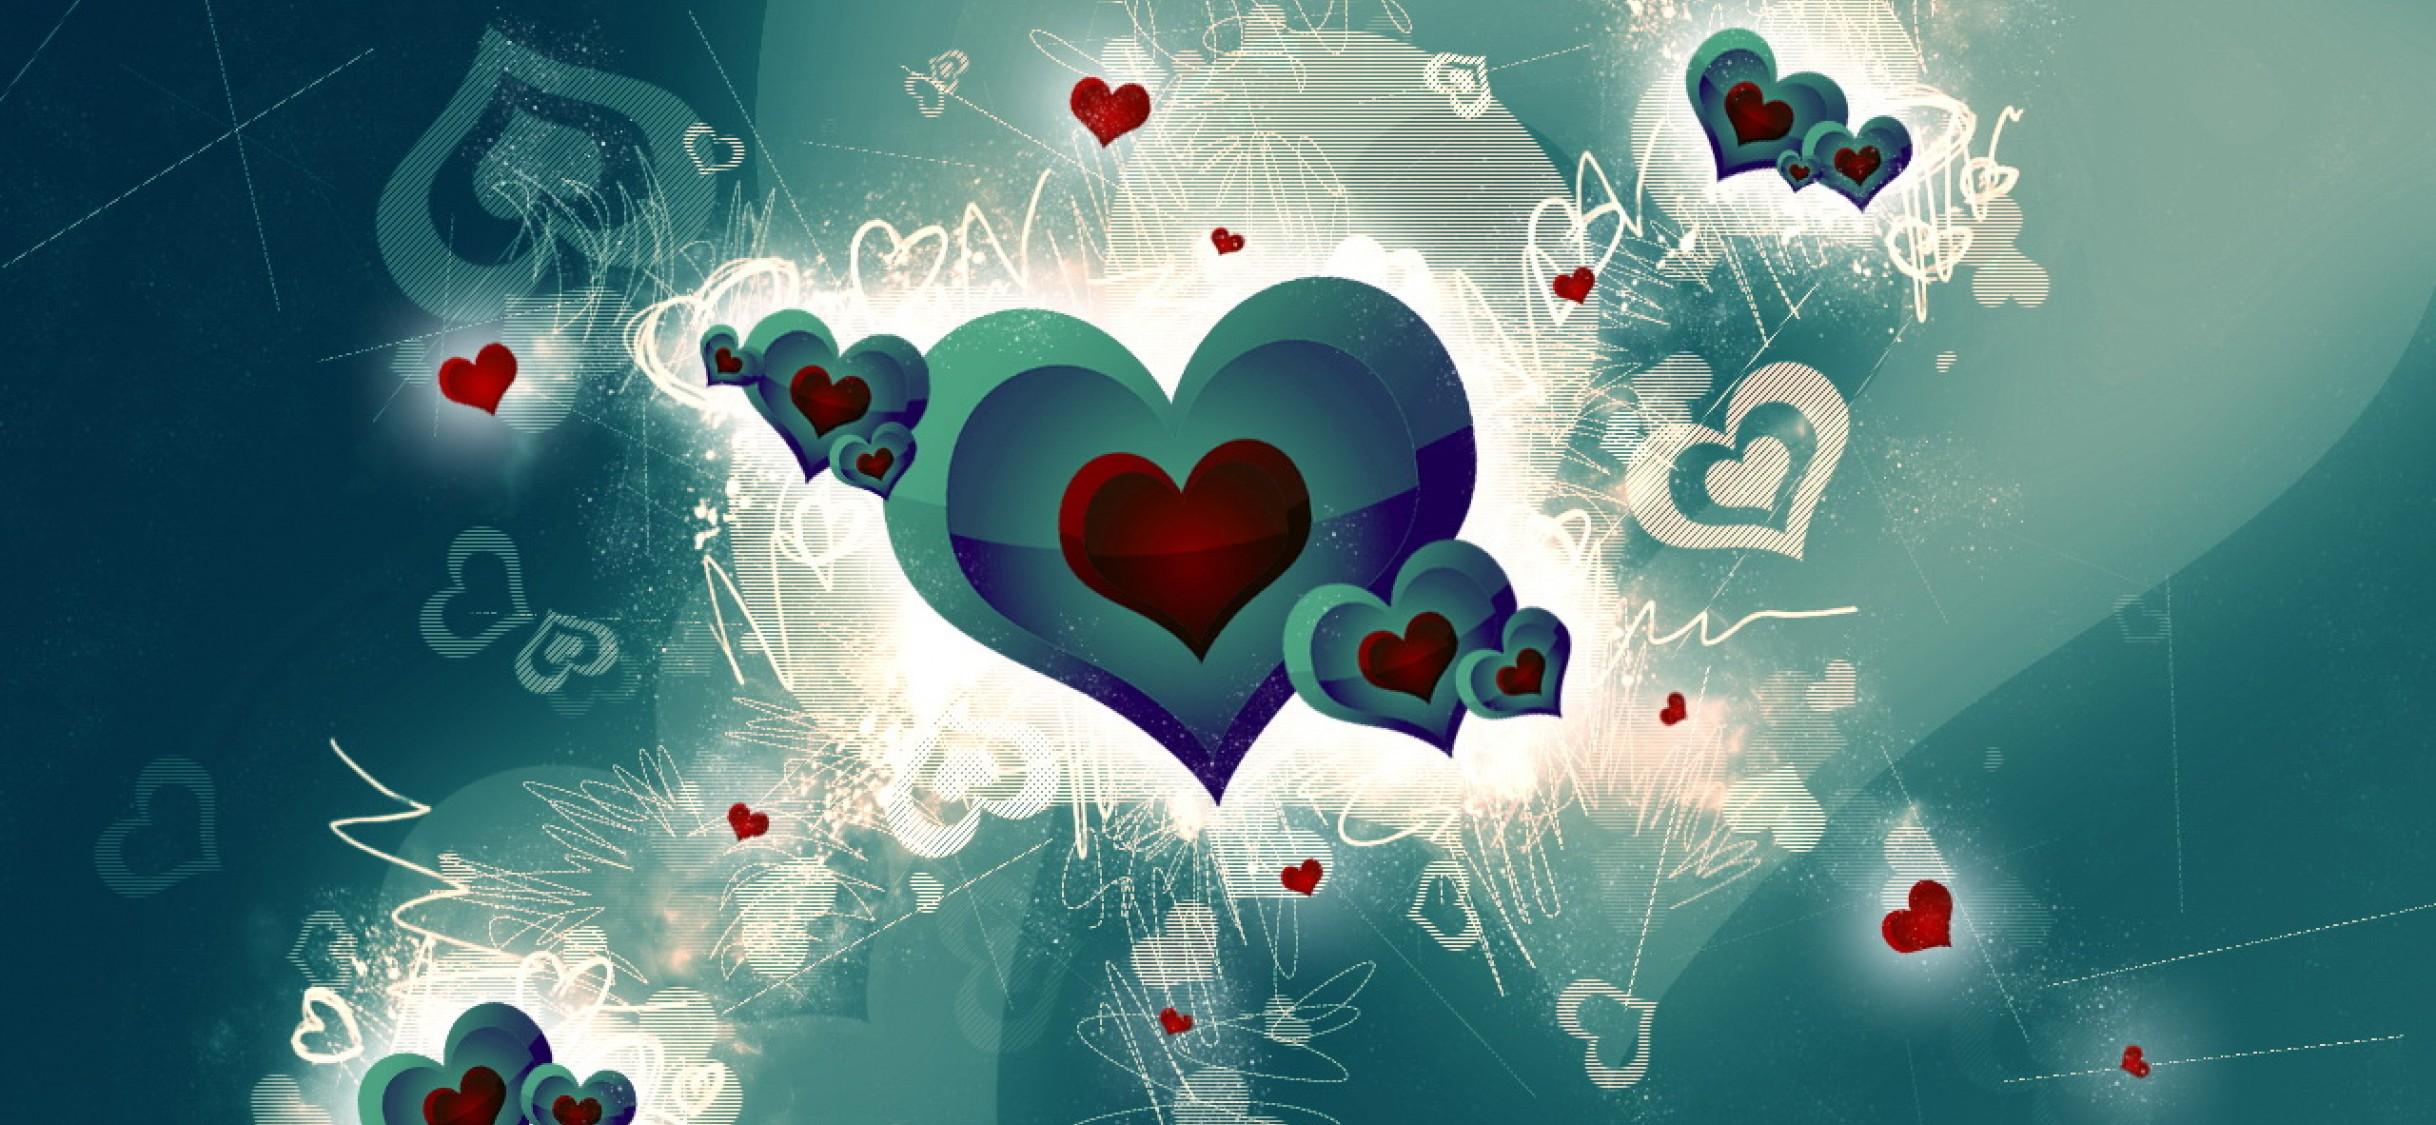 Free Best Beautiful Love Vector Hd Wallpaper For Desktop And